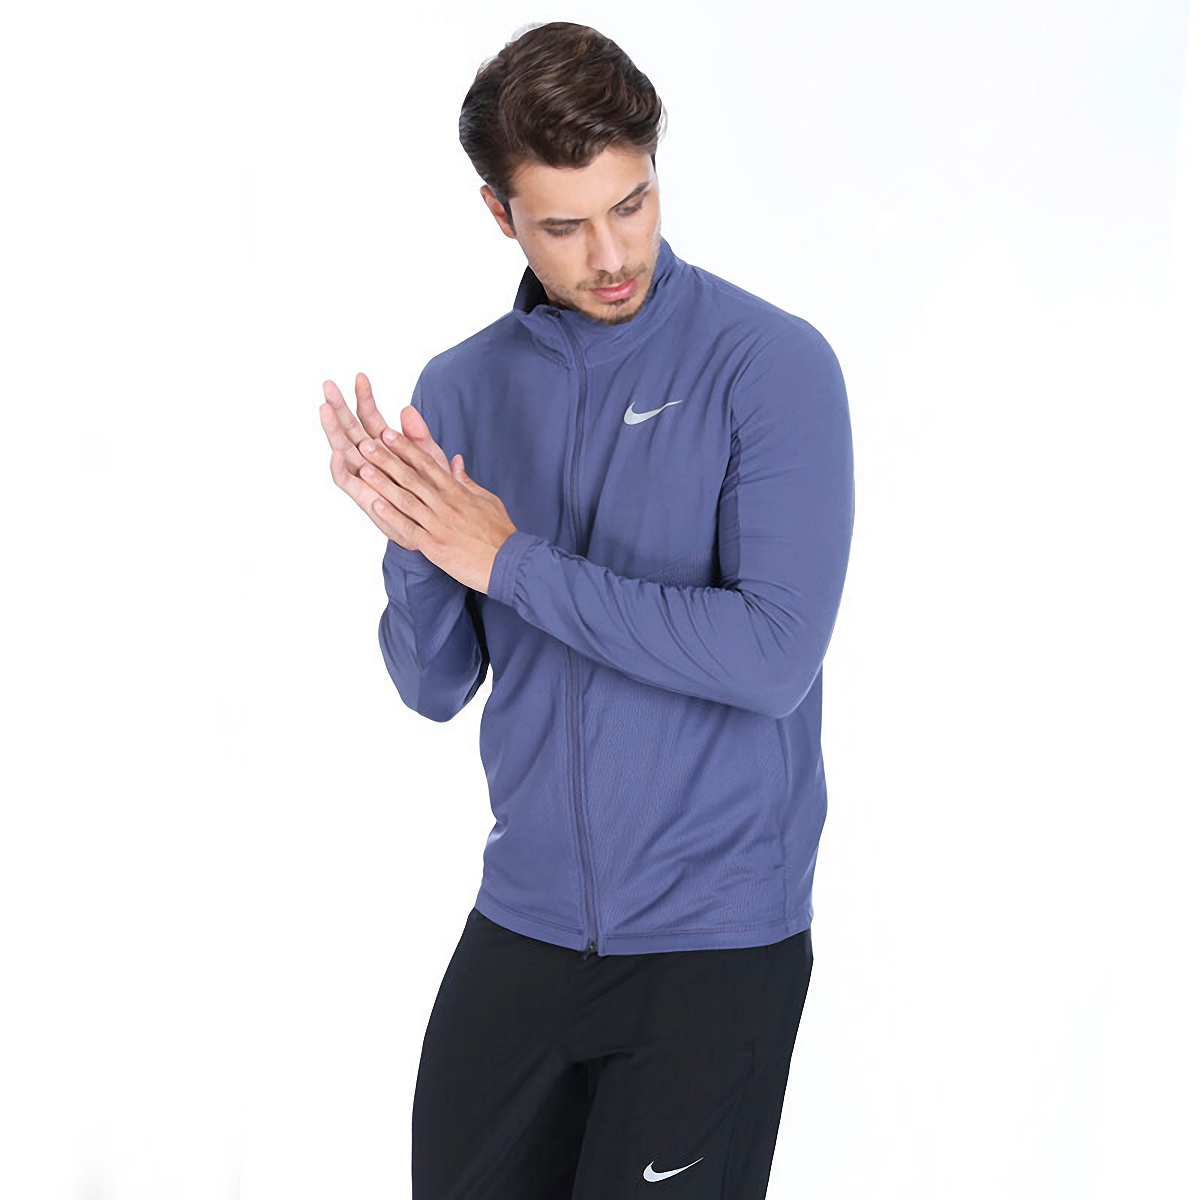 Men's Nike Element Full Zip, , large, image 1